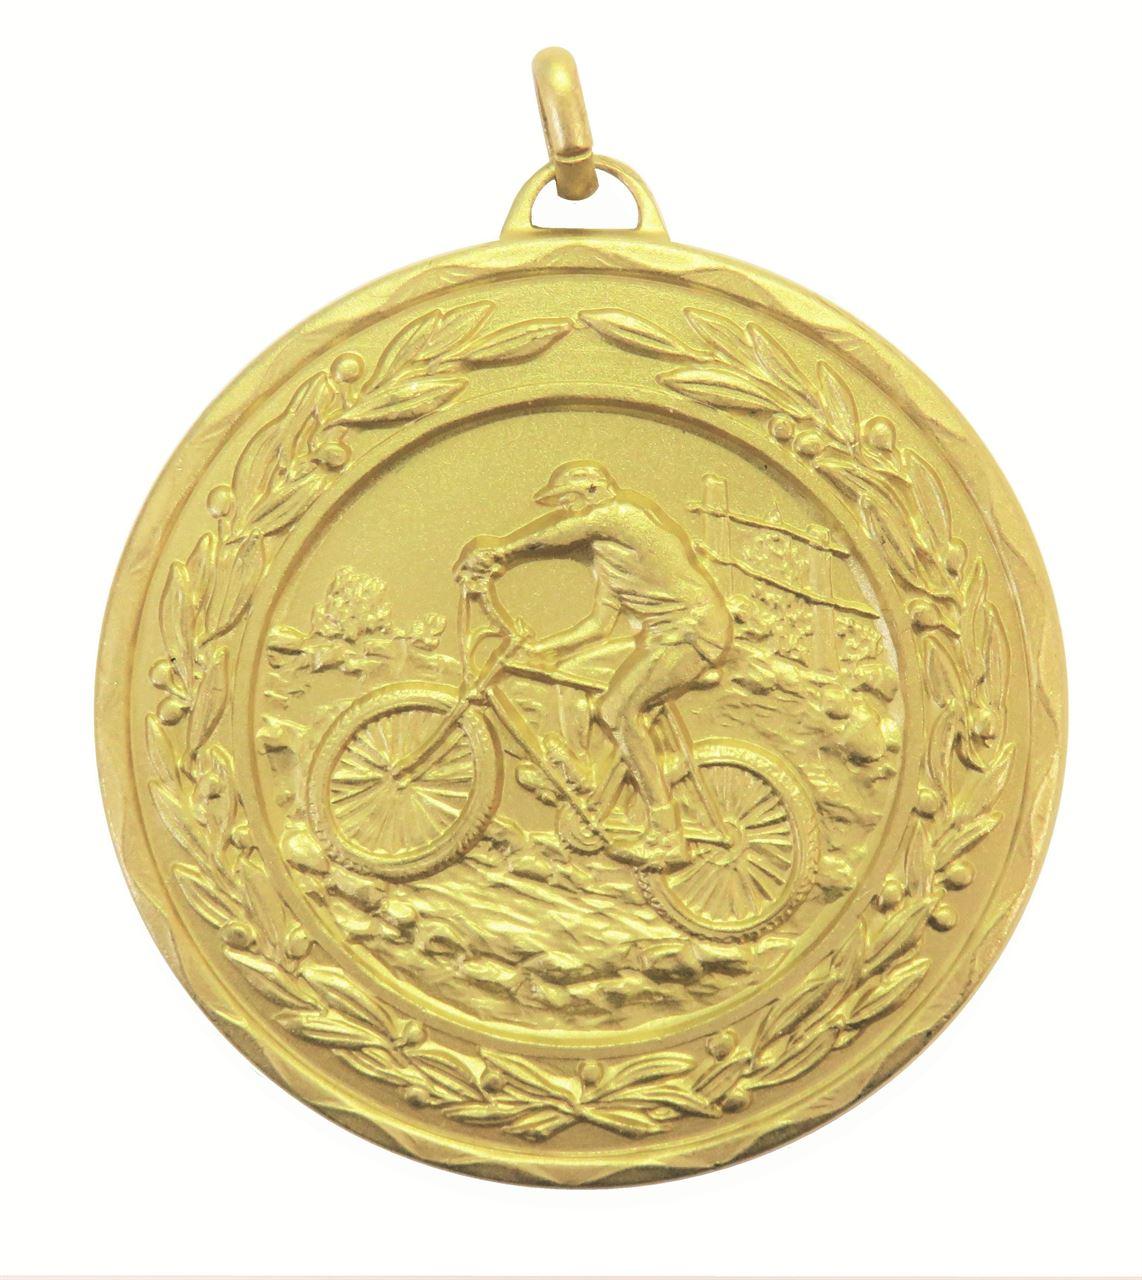 Gold Laurel Economy Mountain Bike Medal (size: 50mm) - 4255E